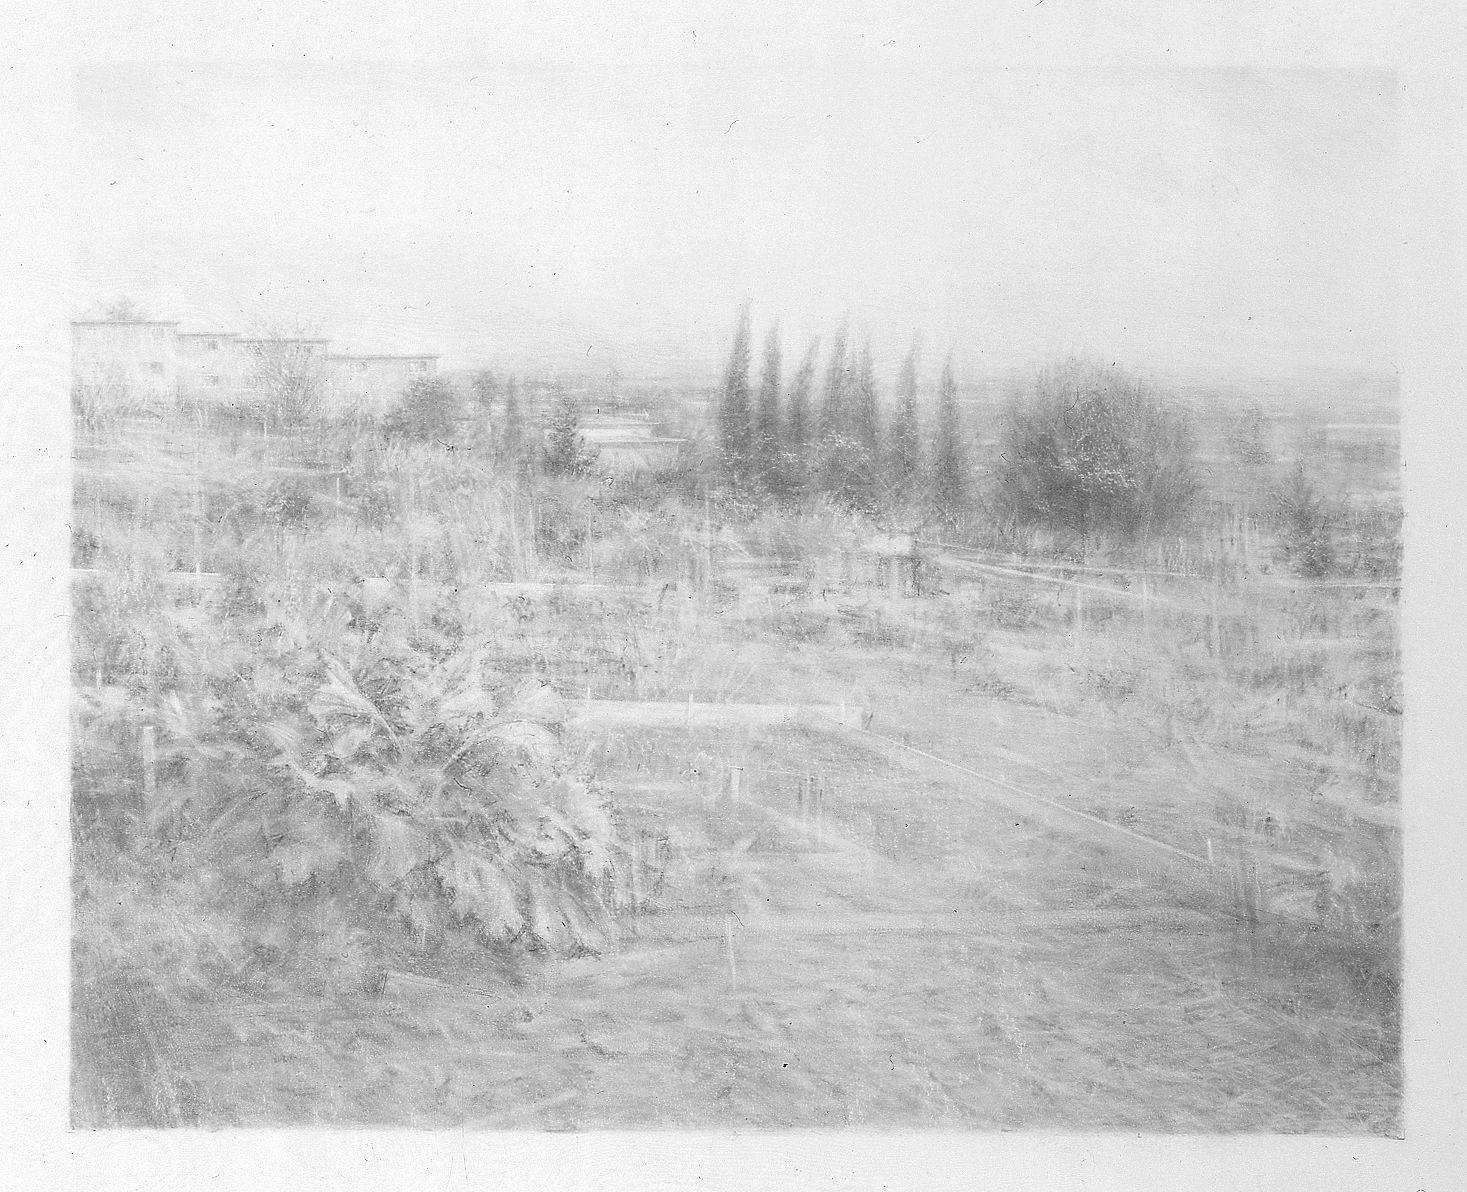 Robert Bauer, Centinela III, 2004, graphite on gessoed paper, 15 x 18 1/4 inches